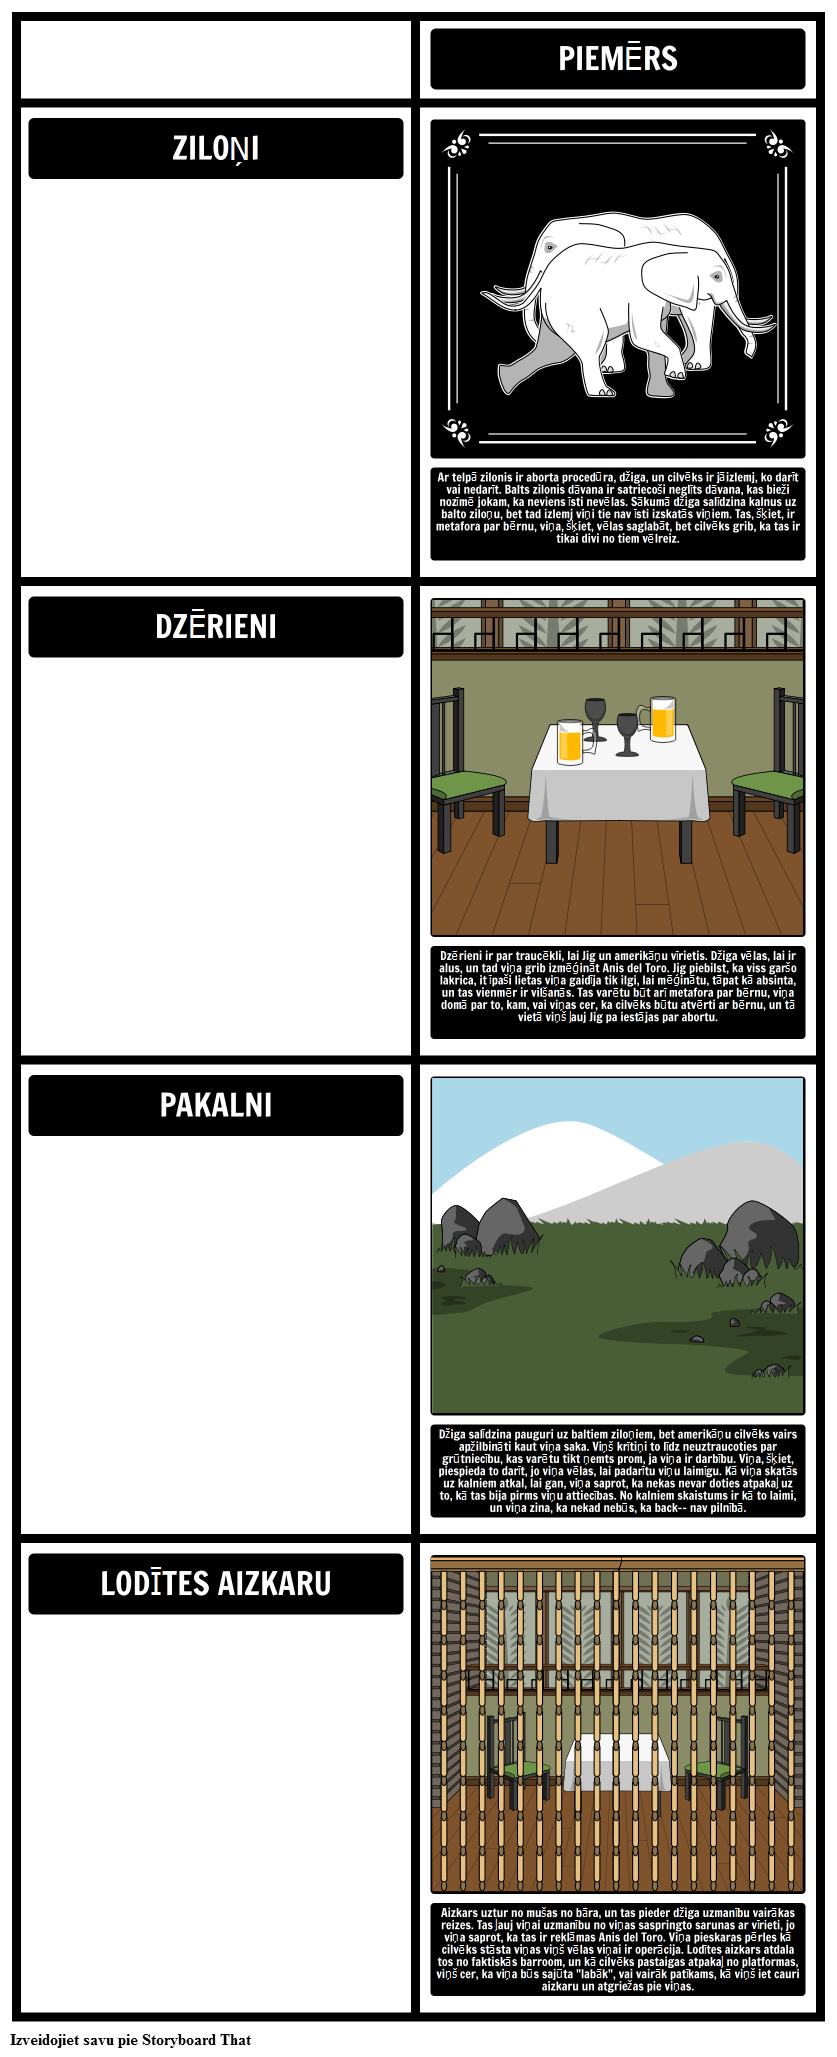 Tēmas, Simbolus un Motīvi Hills Like White Elephants